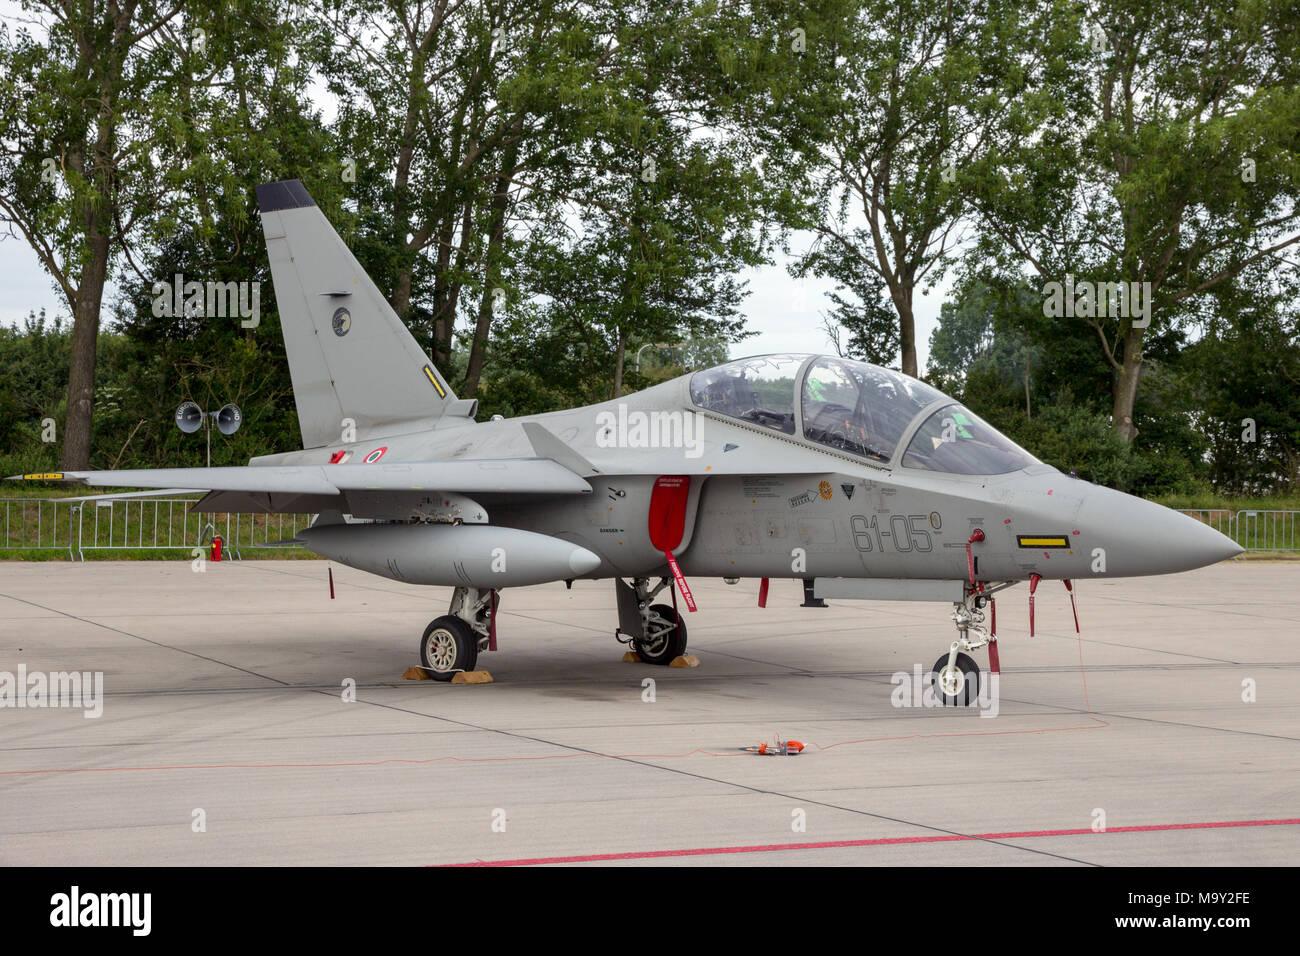 LEEUWARDEN, THE NETHERLANDS - JUN 10, 2016: Italian Air Force Alenia Aermacchi M-346 (T-346A) Master trainer jet. - Stock Image